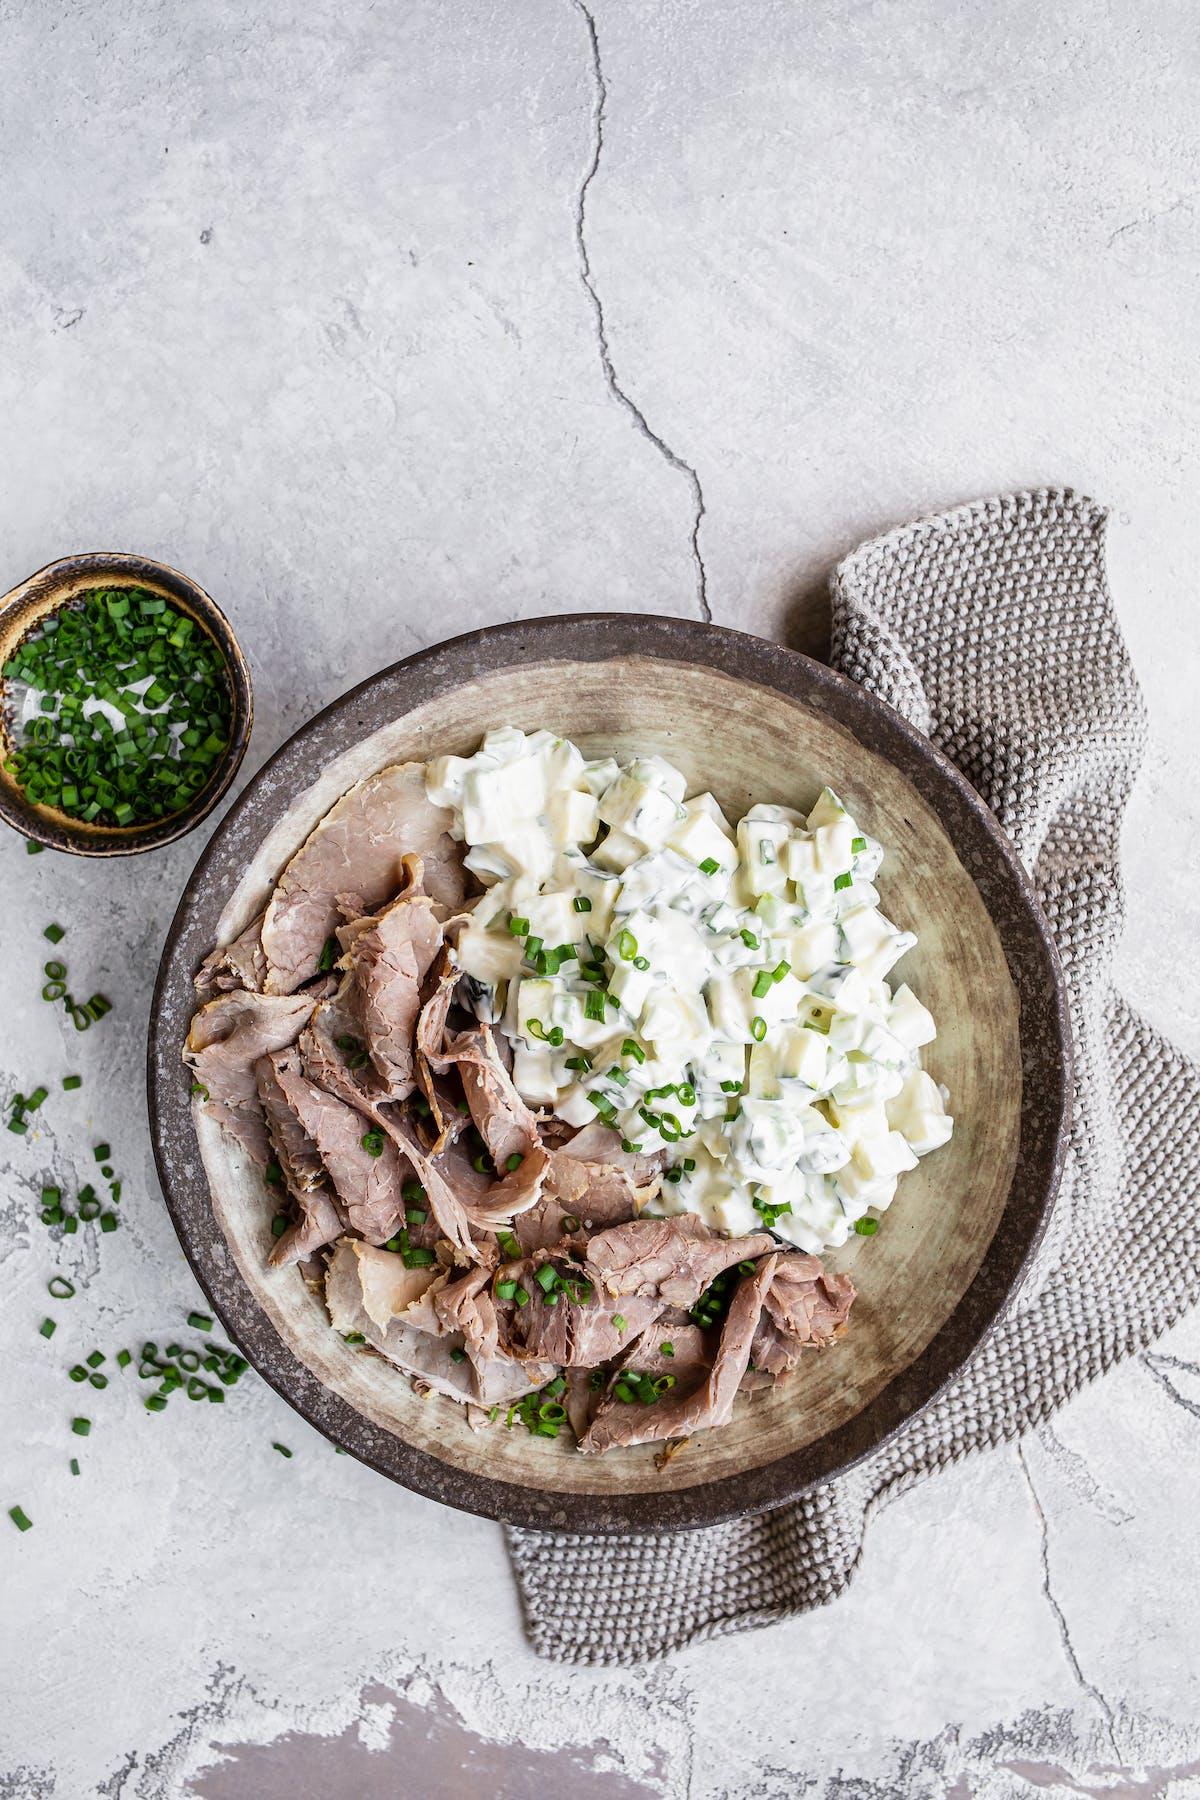 Roast beef with keto no-tato salad